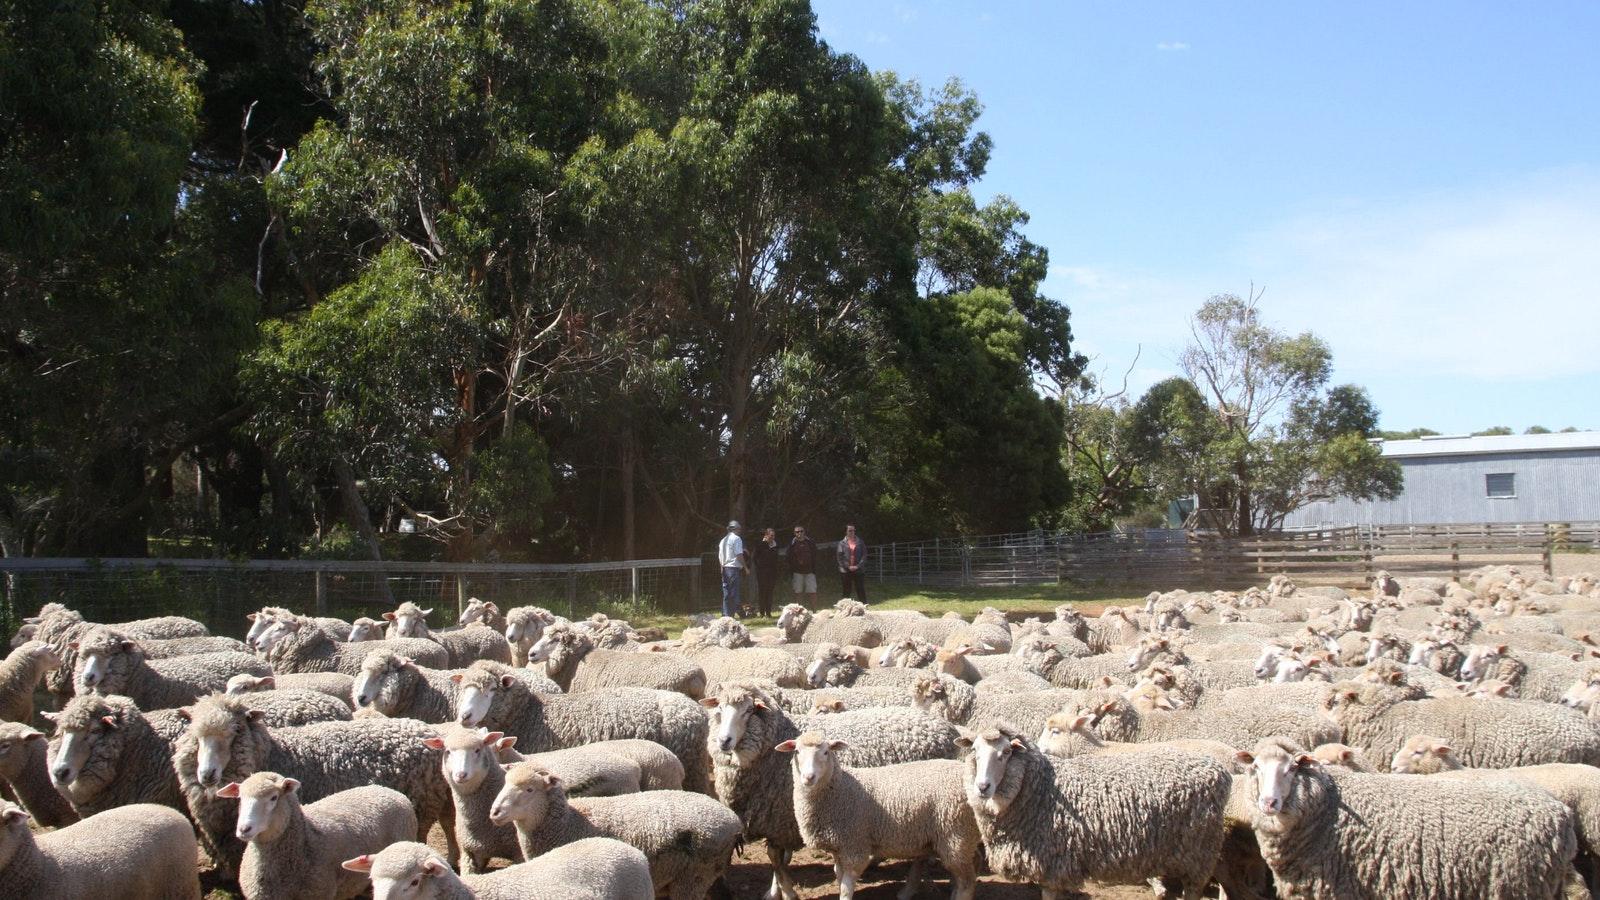 Lamb production